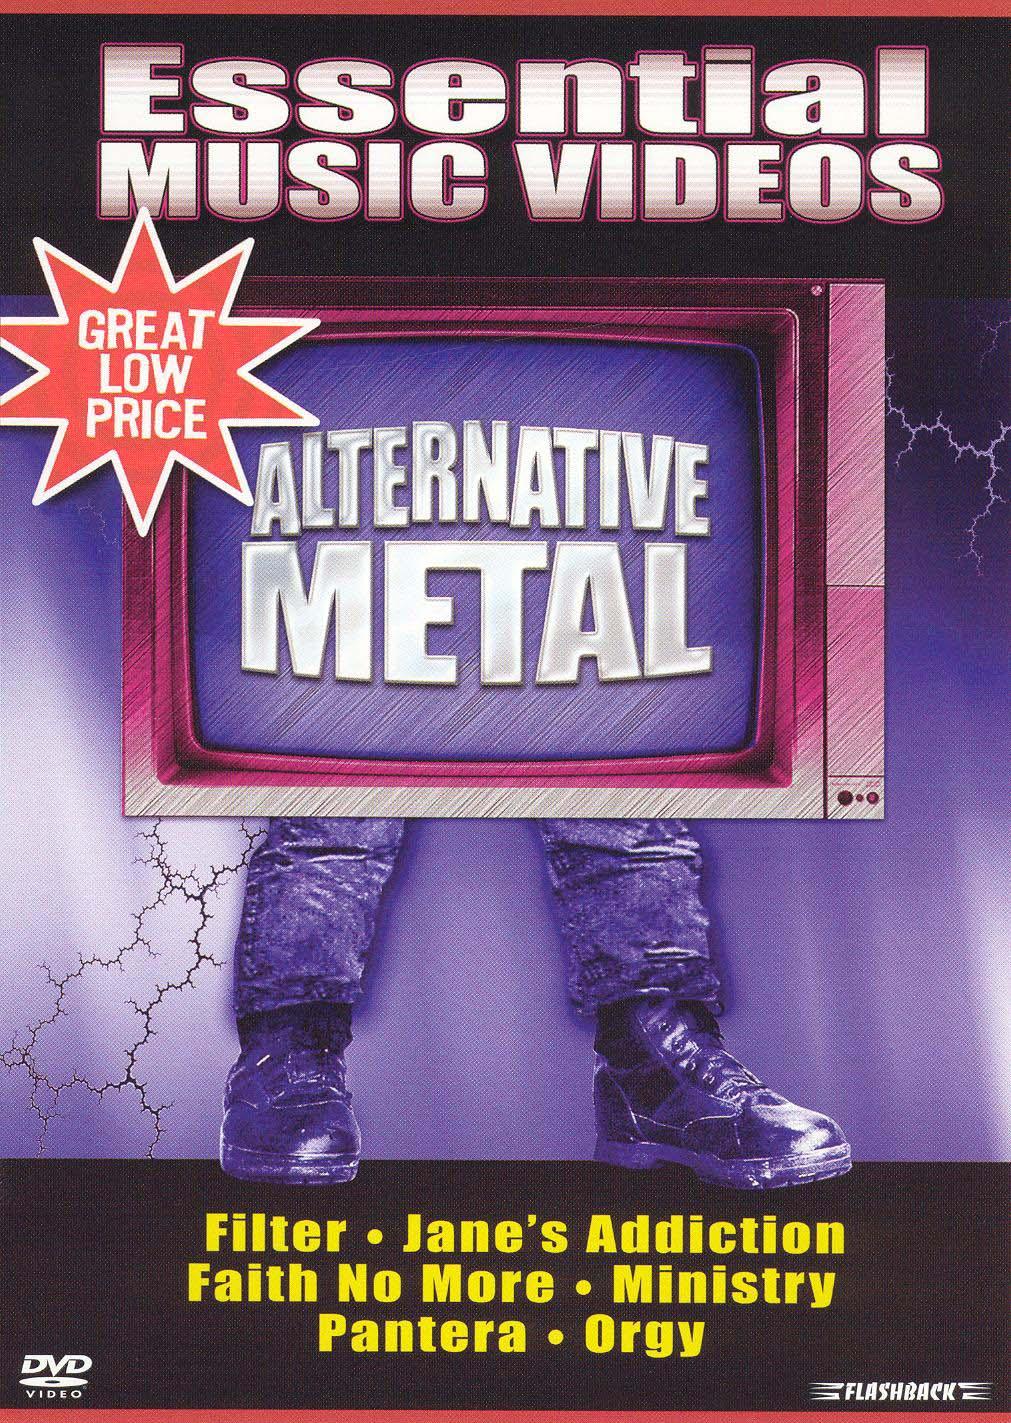 Essential Music Videos: Alternative Metal